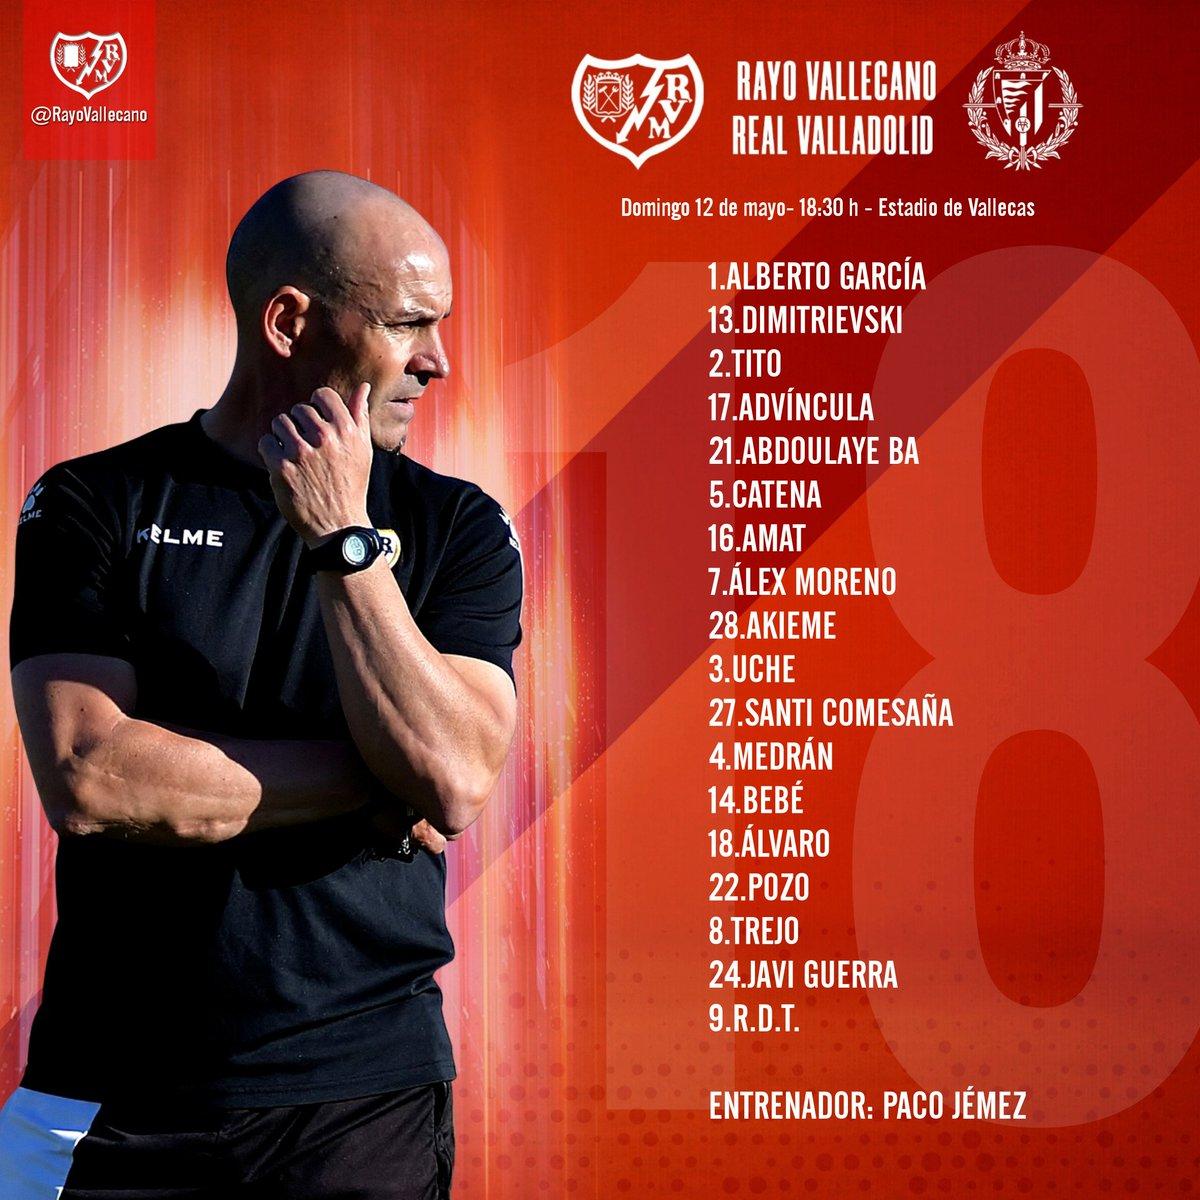 D6SB-qeW4AAcpil Di santo, Imbula, Kakuta y Velázquez fuera de la lista para recibir al Valladolid - Comunio-Biwenger